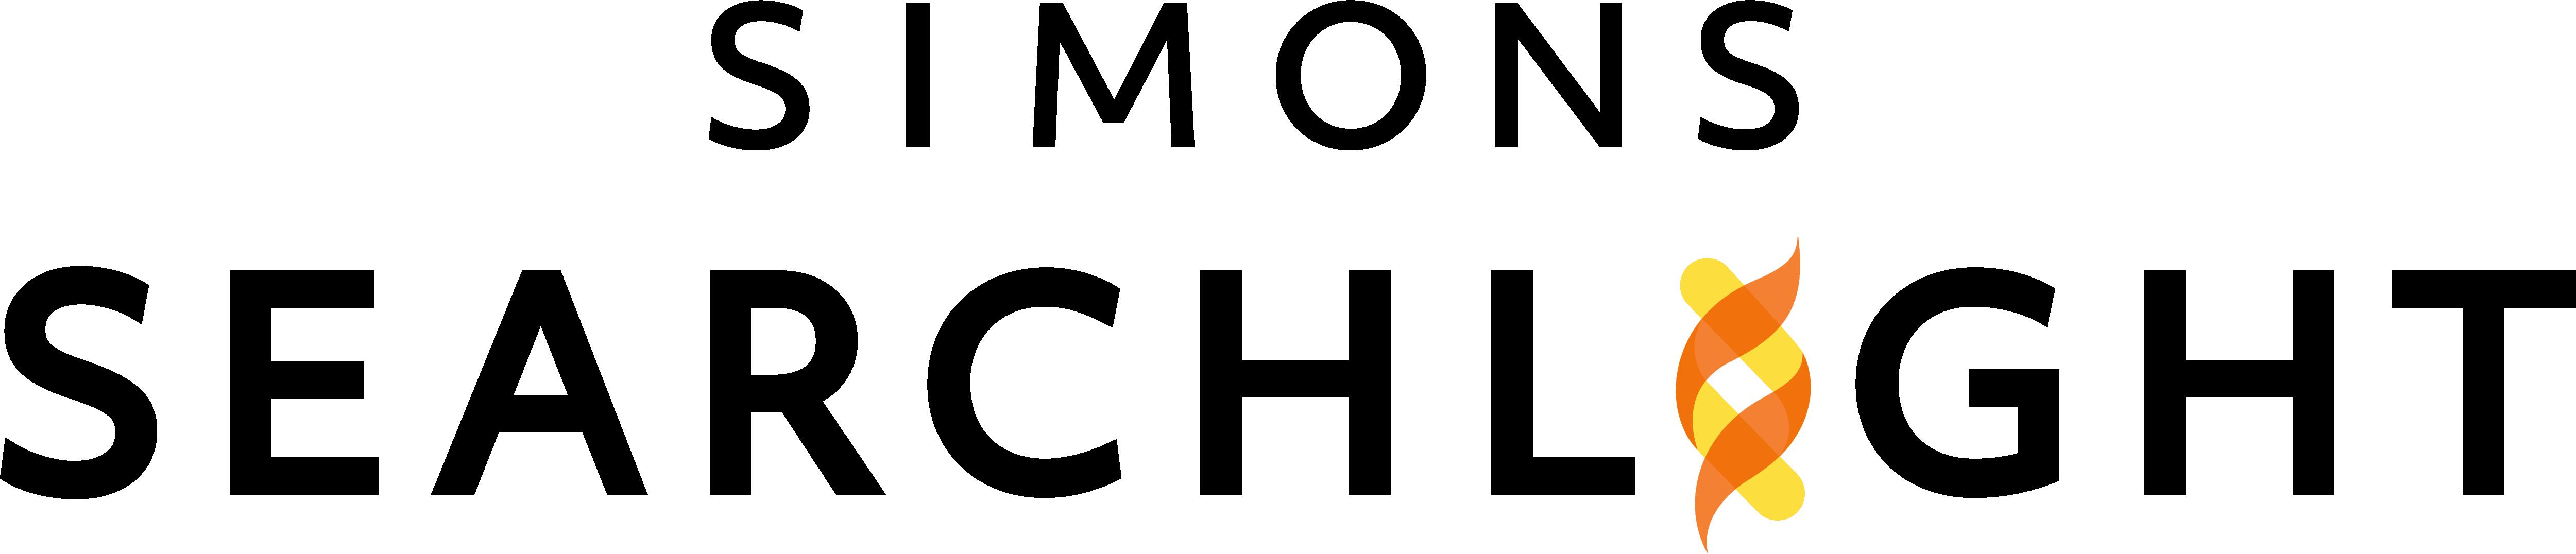 New)Searchlight_Logo_wSIMONS_RGB